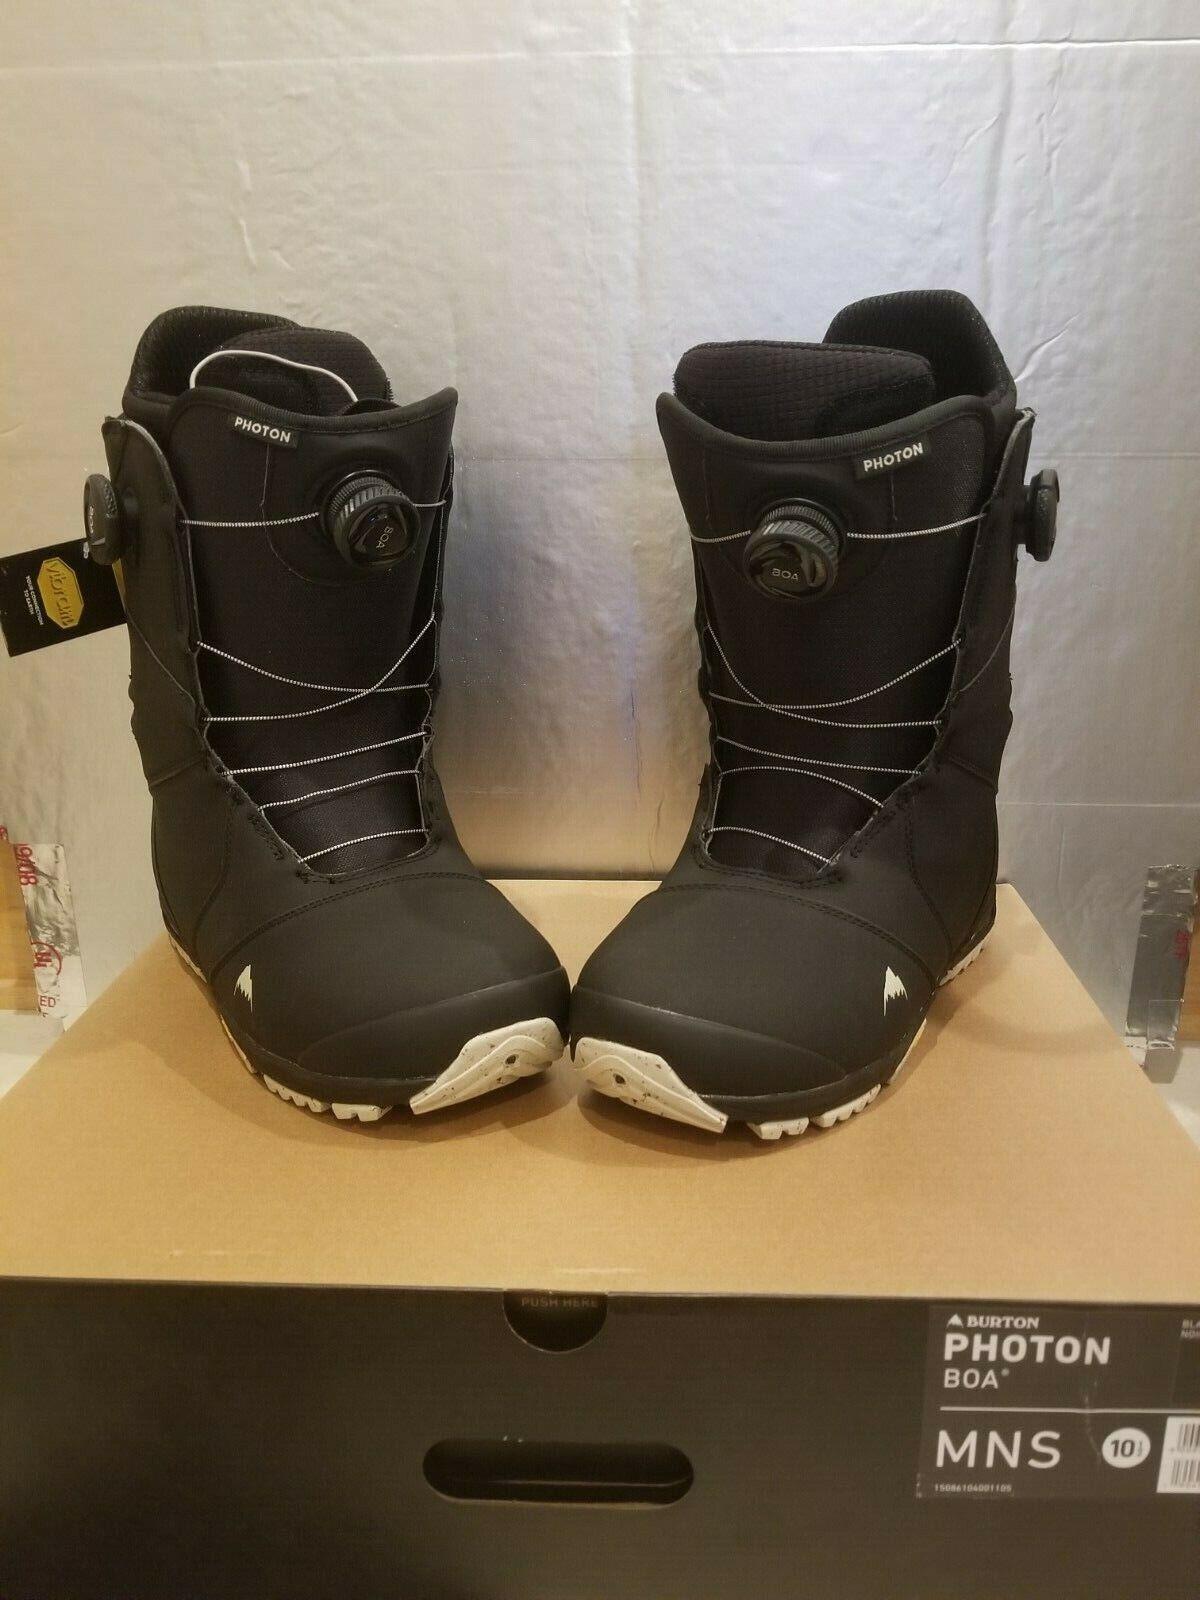 NEW Burton PHOTON Men's Snowboard DOUBLE BOA Boots 10.5 Rule